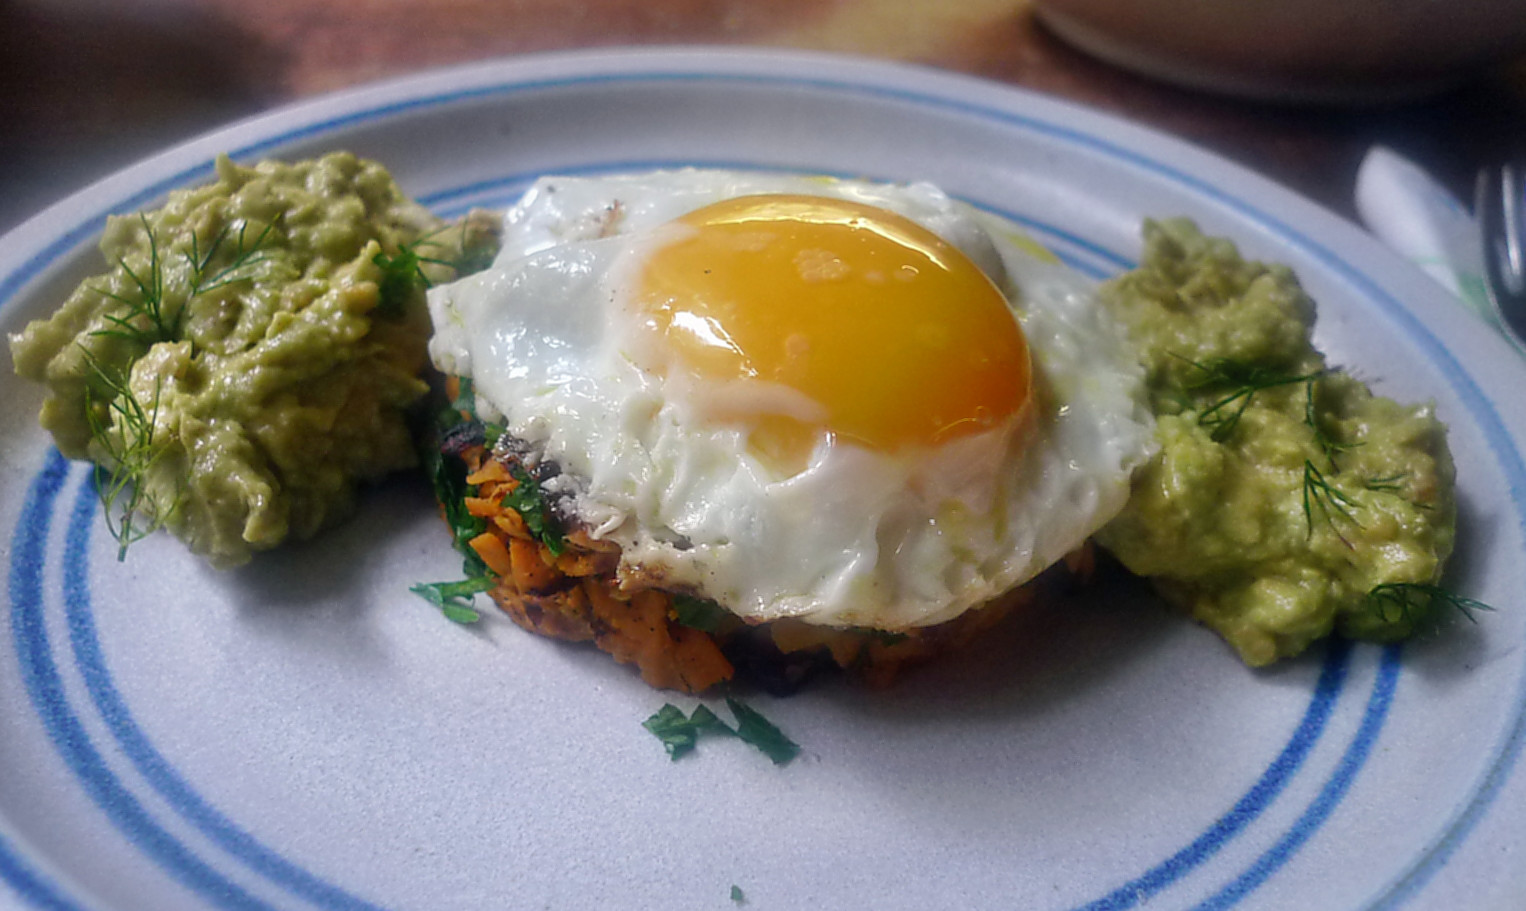 .Süßkartoffel-Guacamole-Spiegelei-18.8.14   (1)